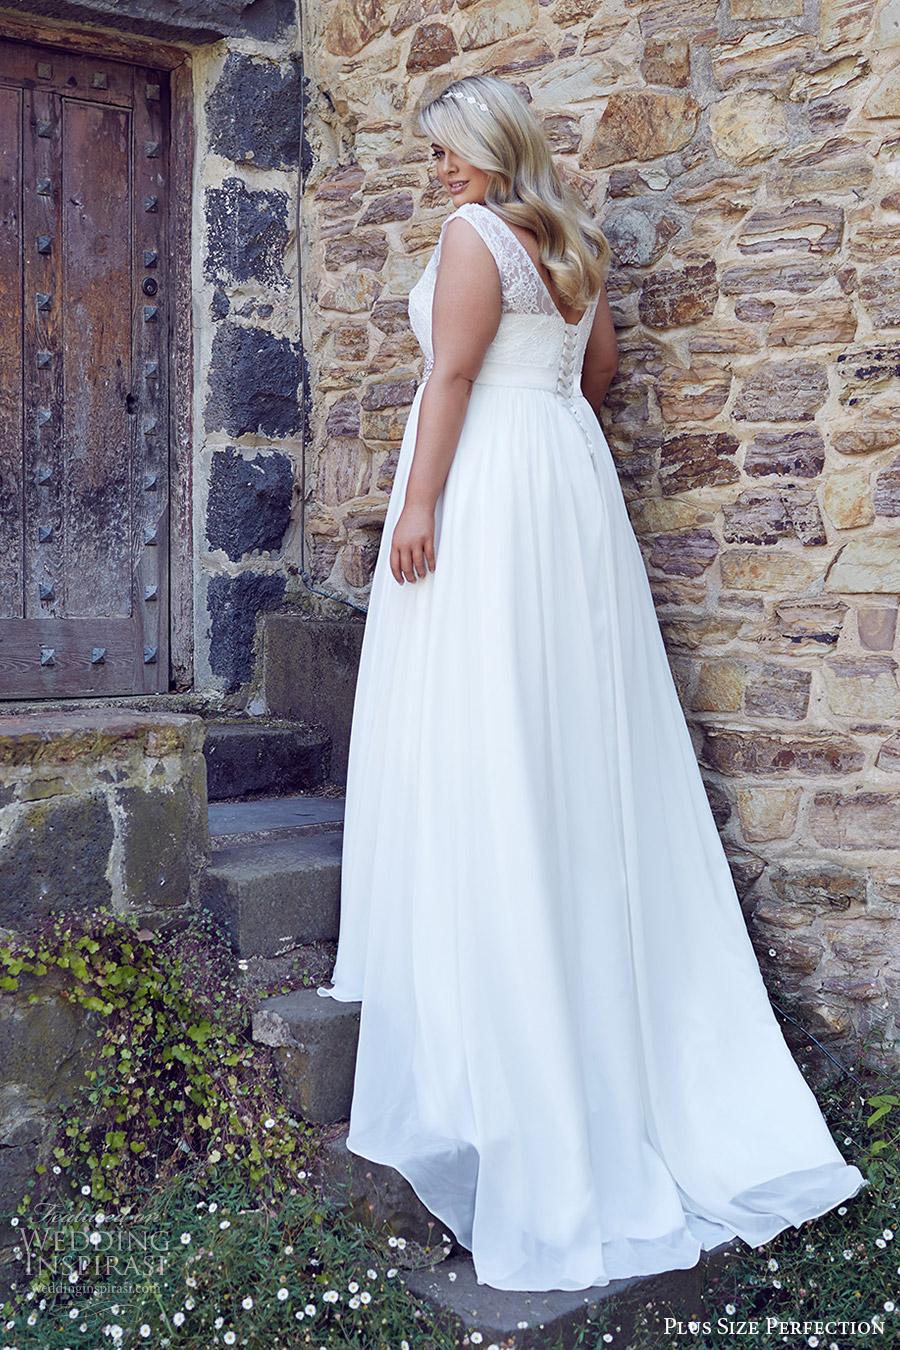 Lace Wedding Dress Plus Size 54 Stunning plus size perfection bridal